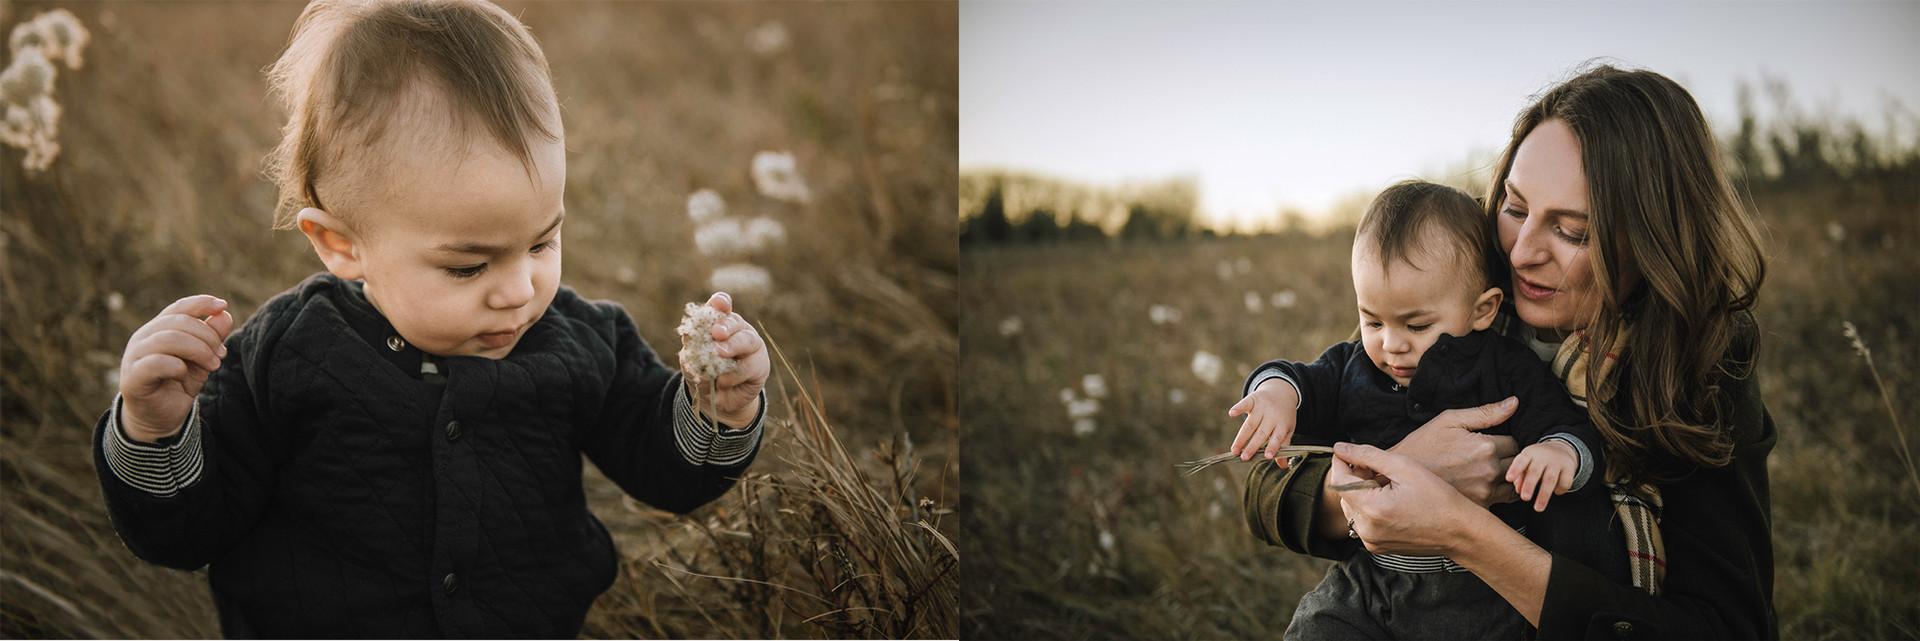 calgary-lifestyle-photographer,-precious